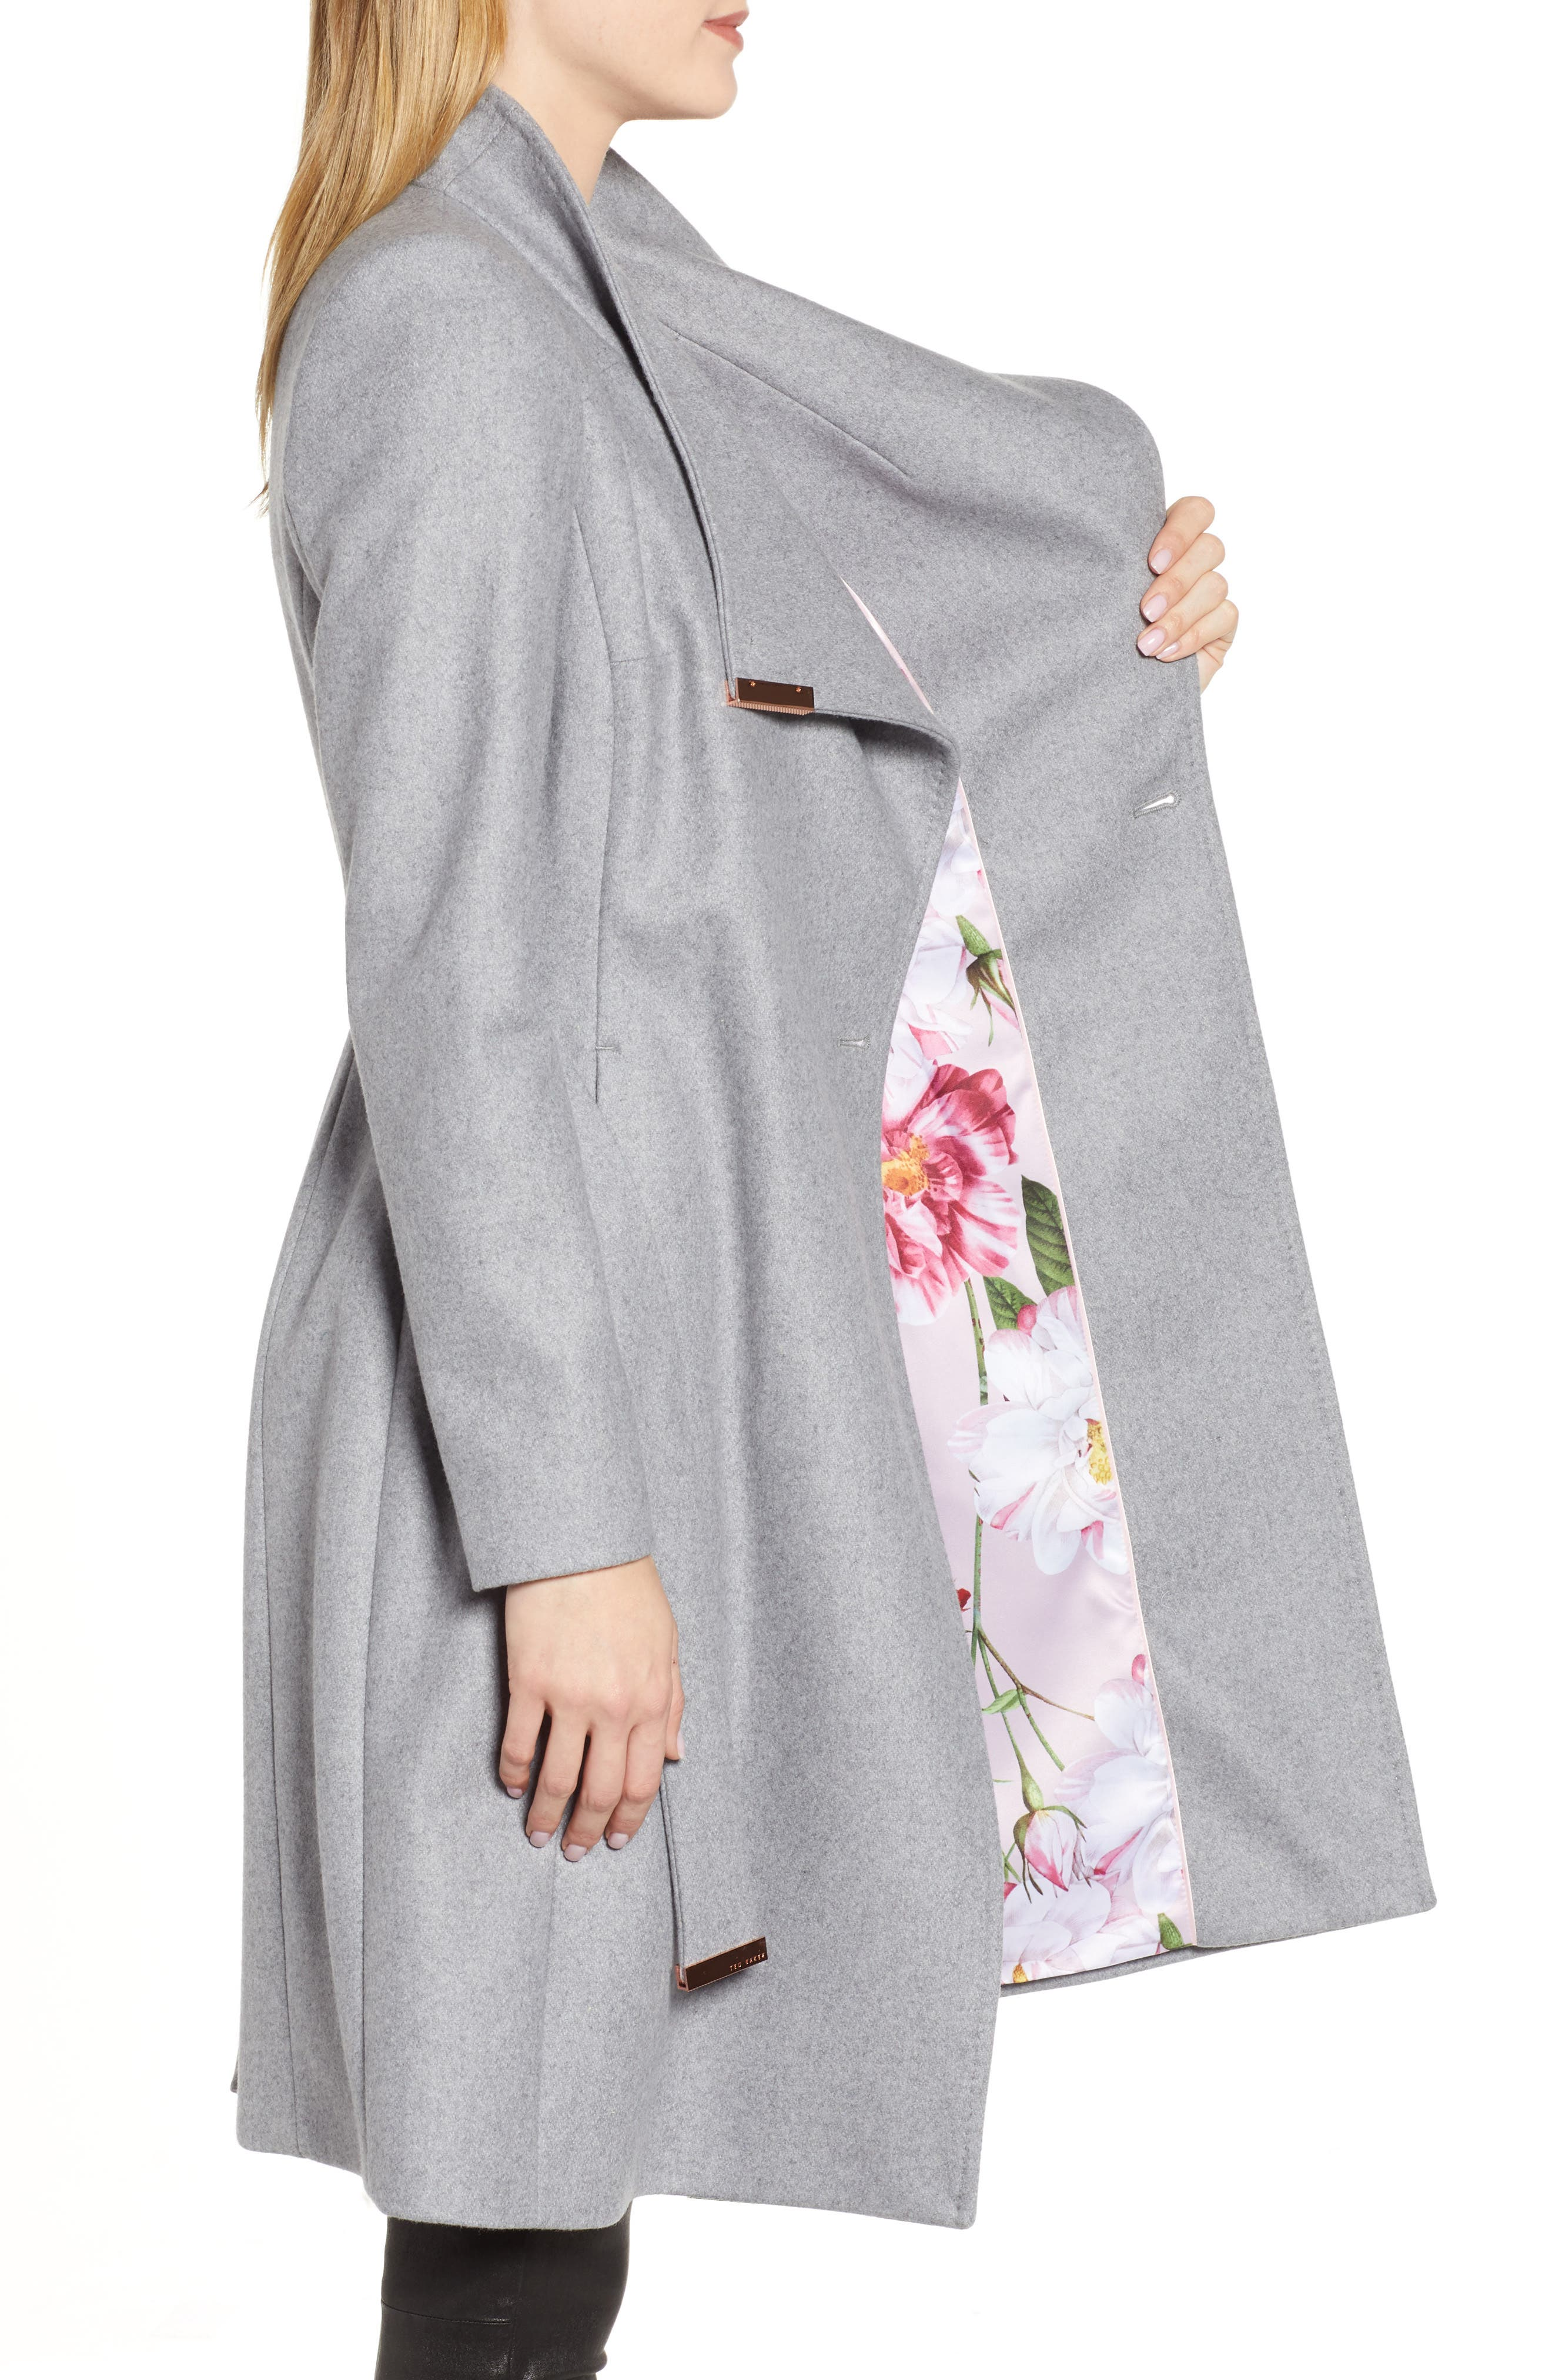 TED BAKER LONDON, Wool Blend Long Wrap Coat, Alternate thumbnail 4, color, 030